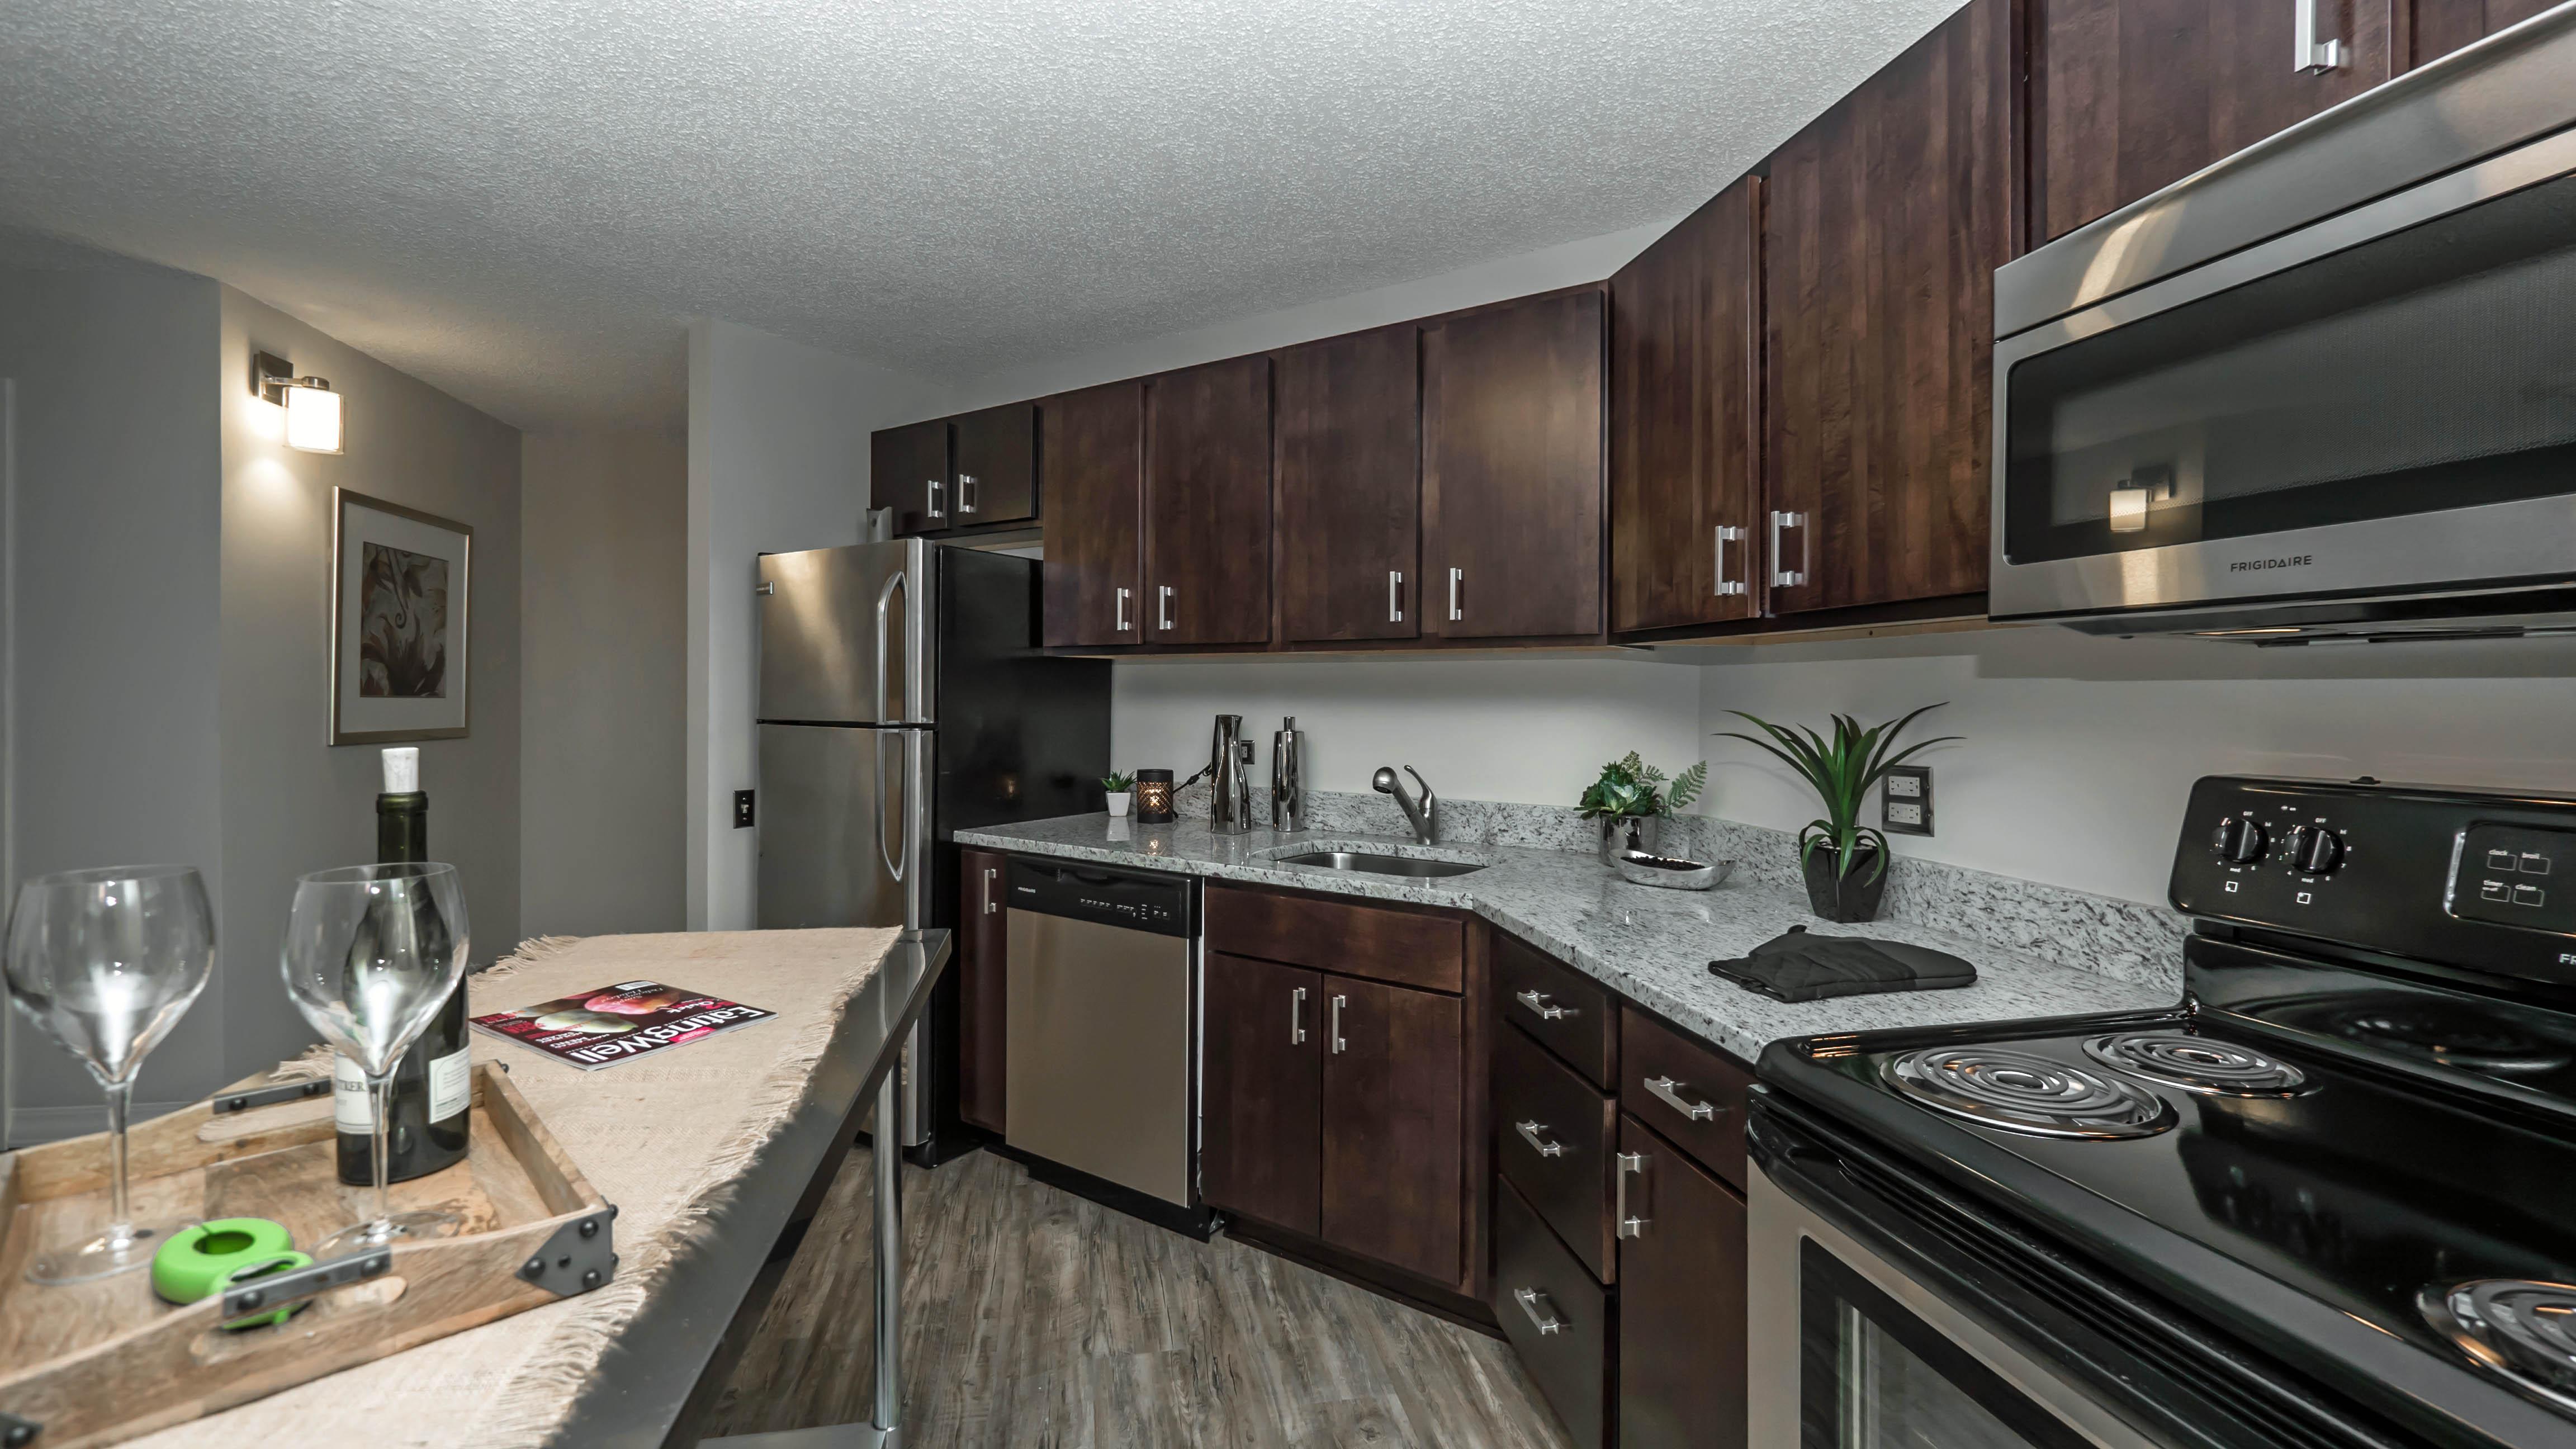 4 Bedroom Apartments In Chicago 4 Bedroom Apartments Chicago 1 2 3 U0026 4 Bedrooms